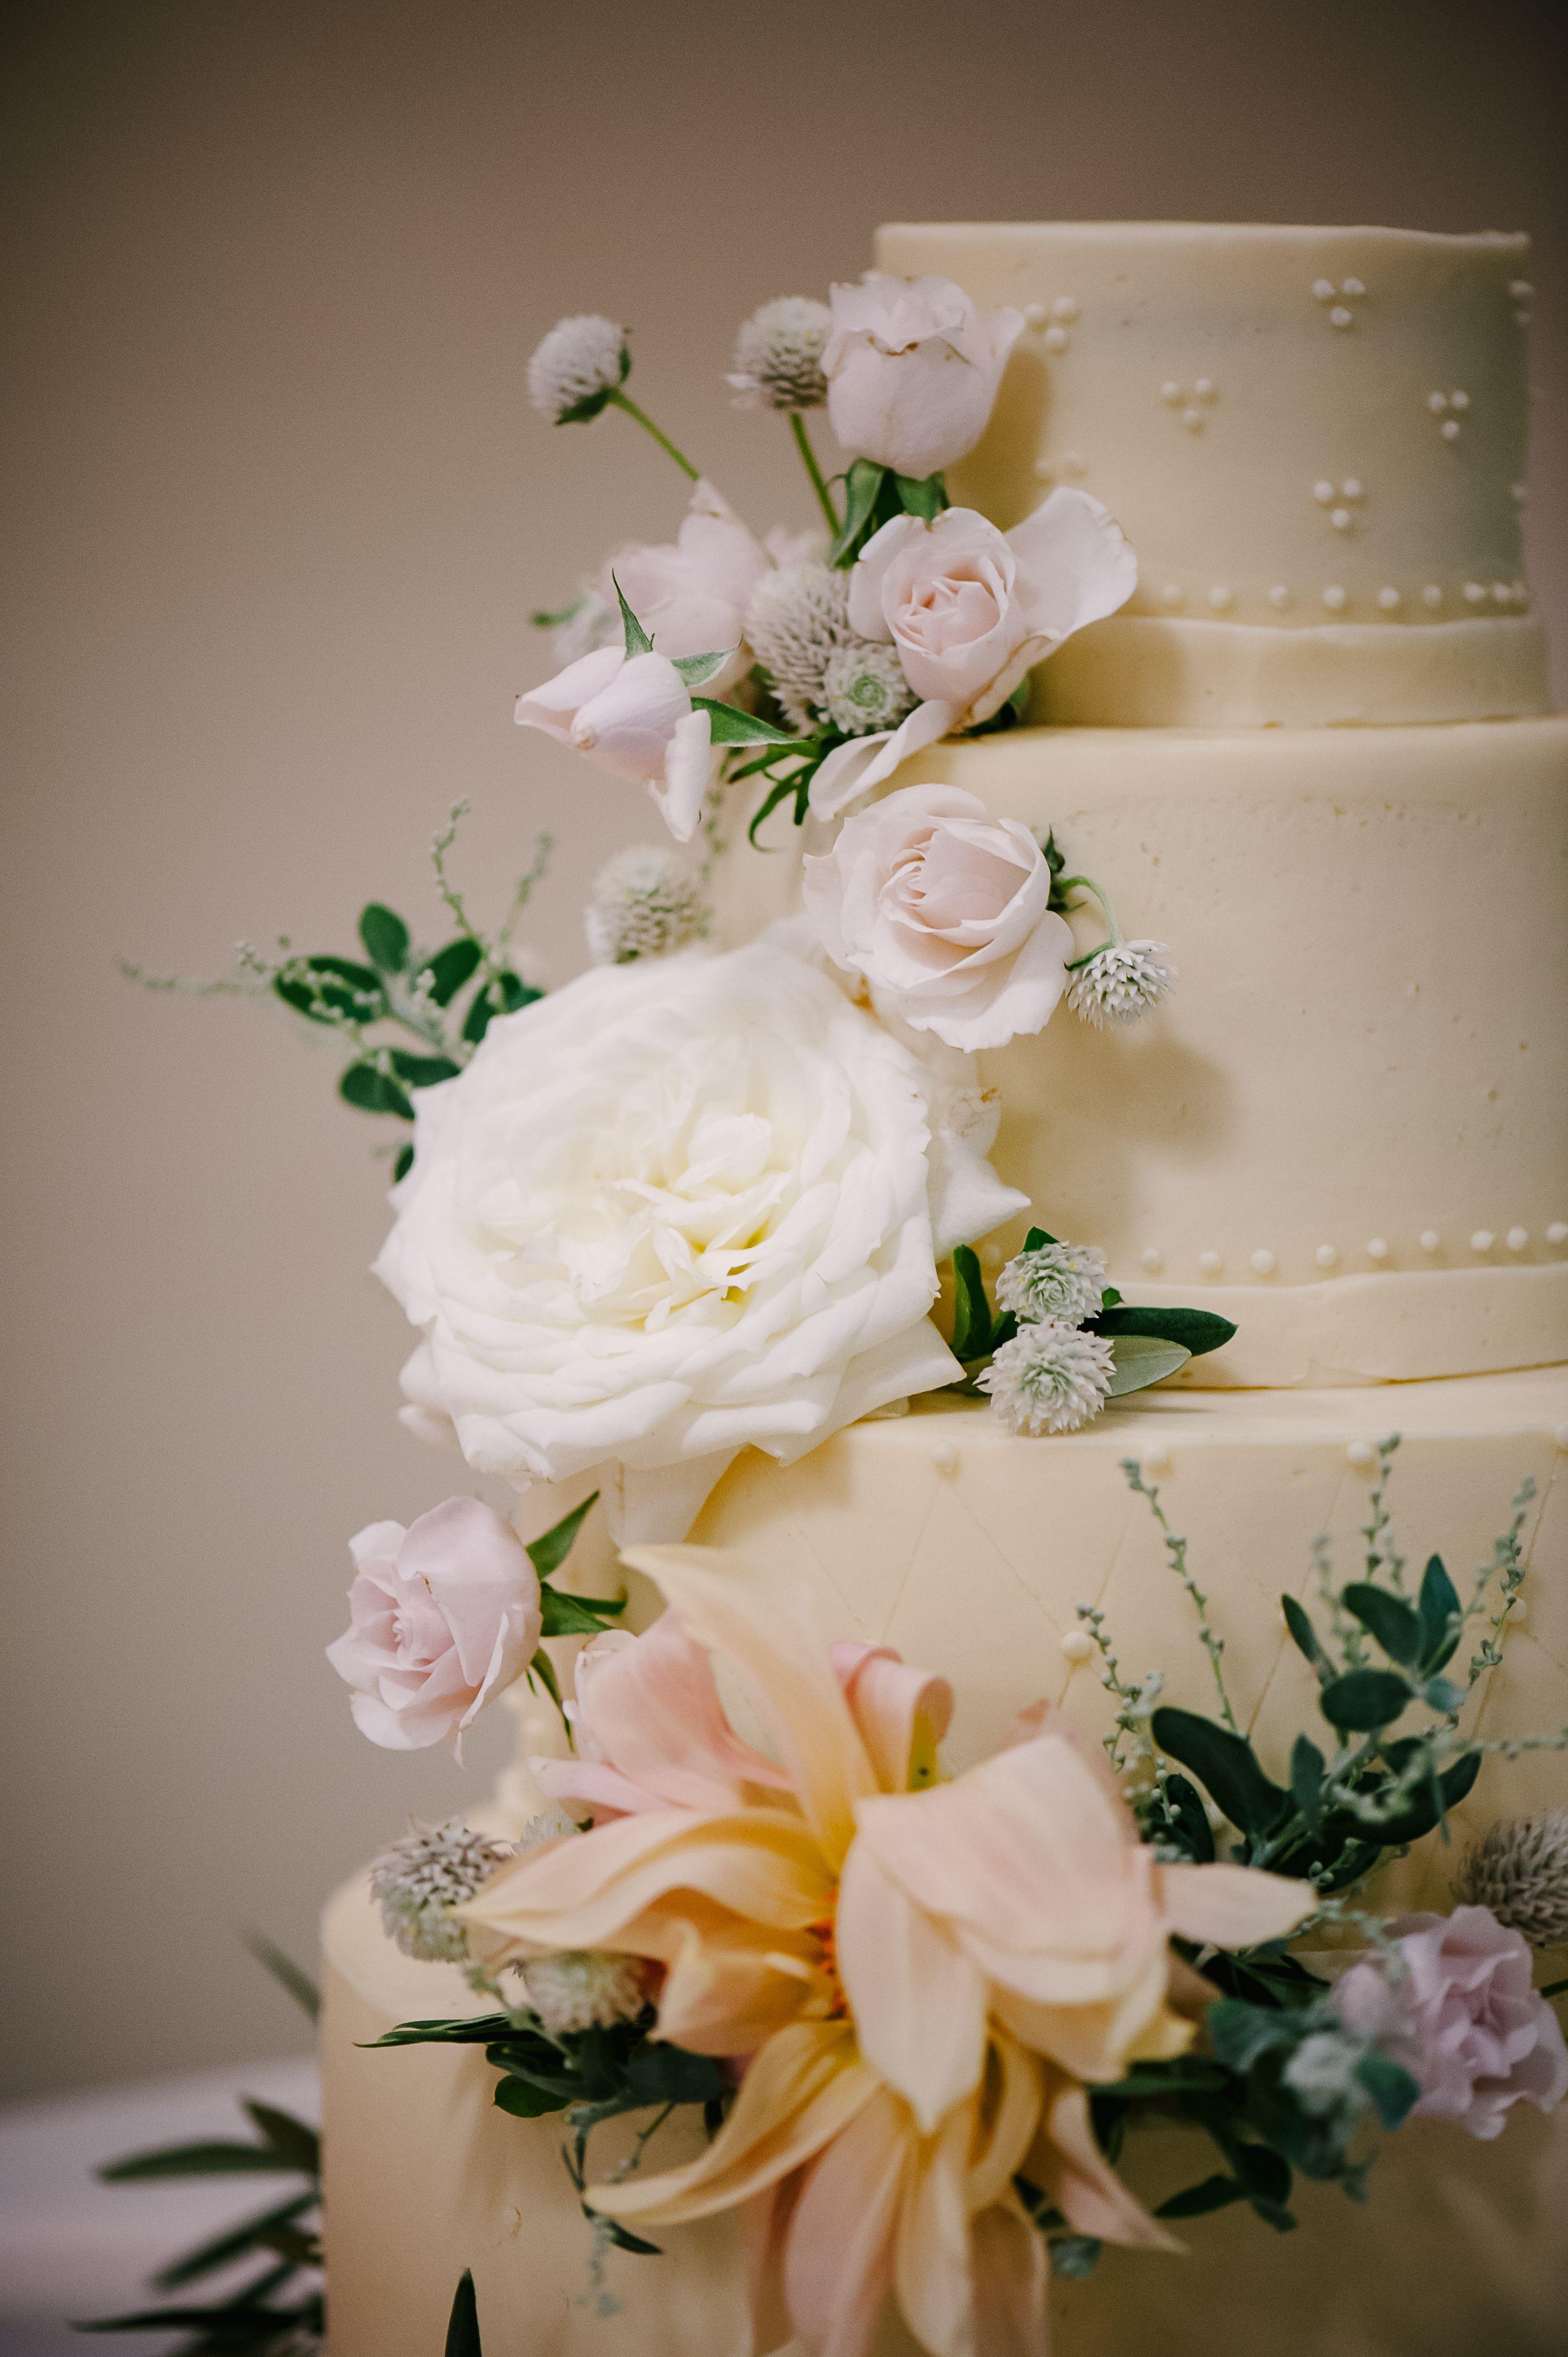 White Peach Blush Pink And Dark Greenery On Wedding Cake By